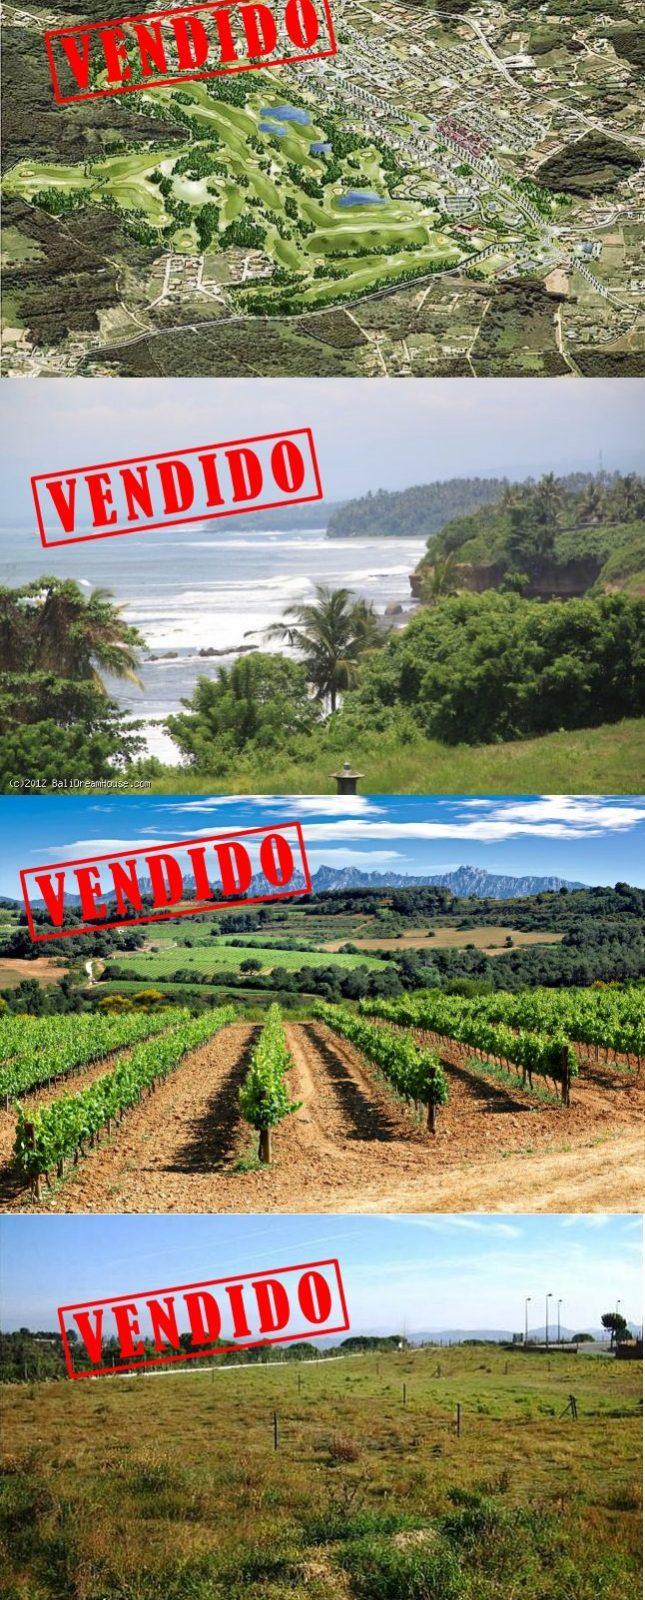 Terrenos-vendidos-foto-varios.jpg